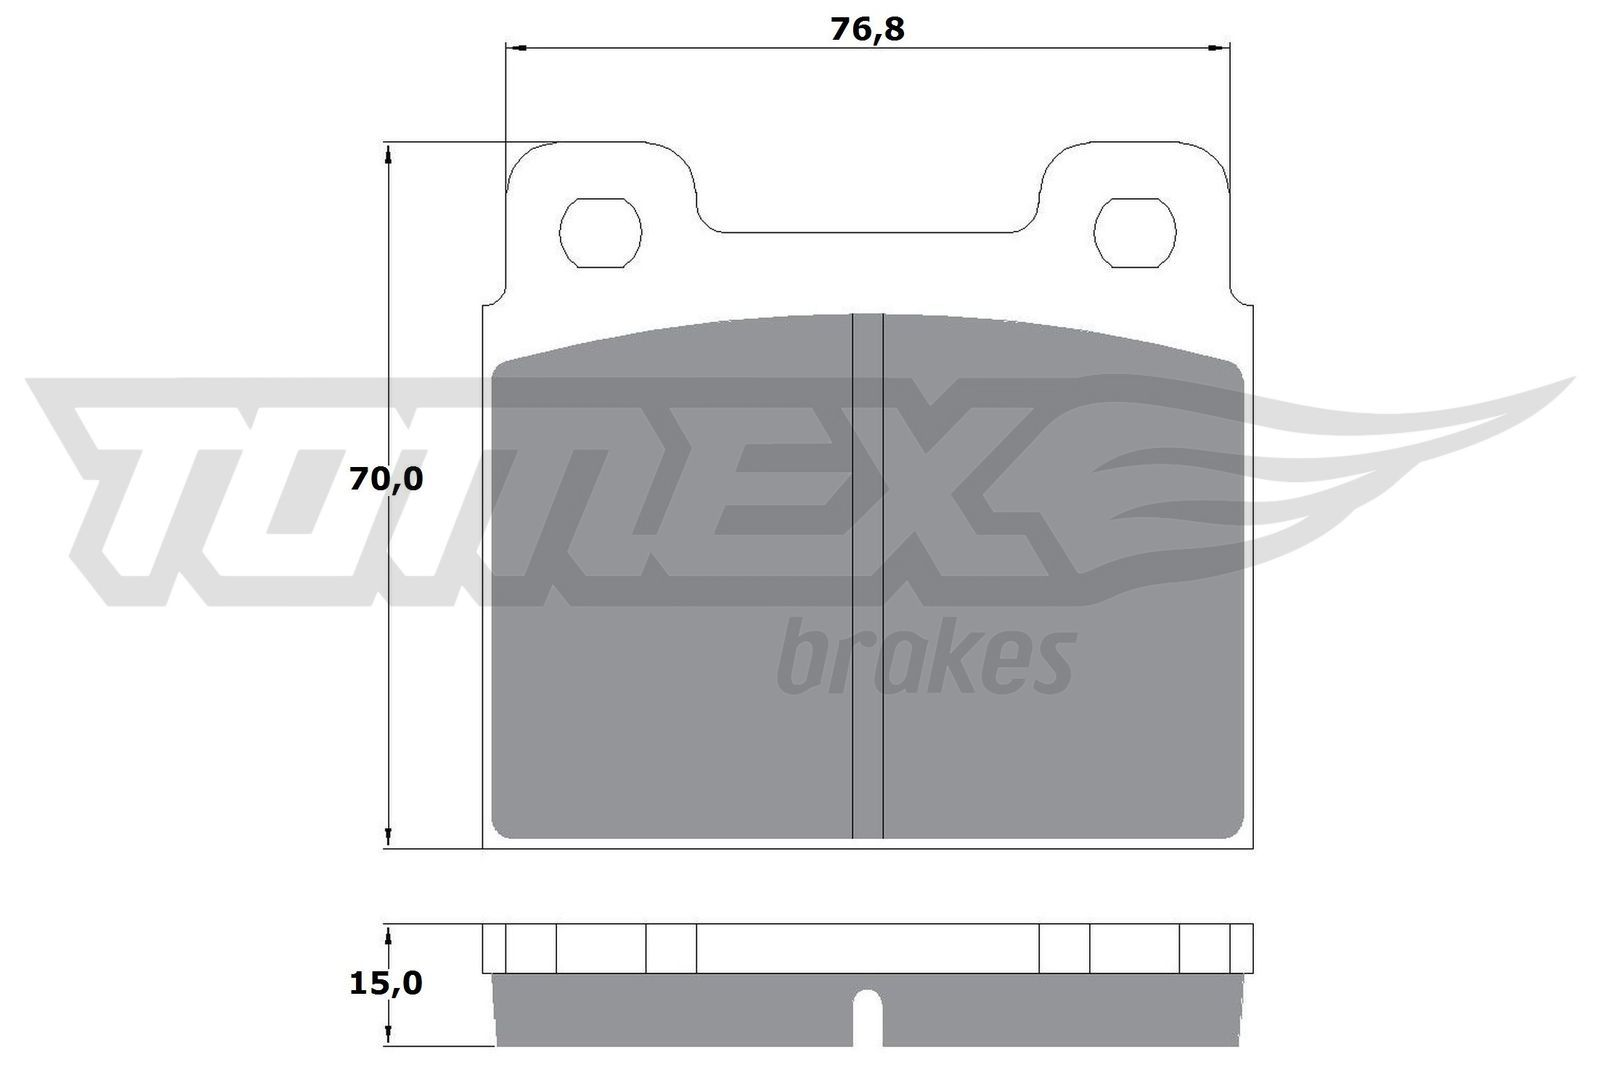 OPEL SENATOR 1986 Bremsbelagsatz - Original TOMEX brakes TX 10-18 Höhe: 70mm, Breite: 76,8mm, Dicke/Stärke: 15mm